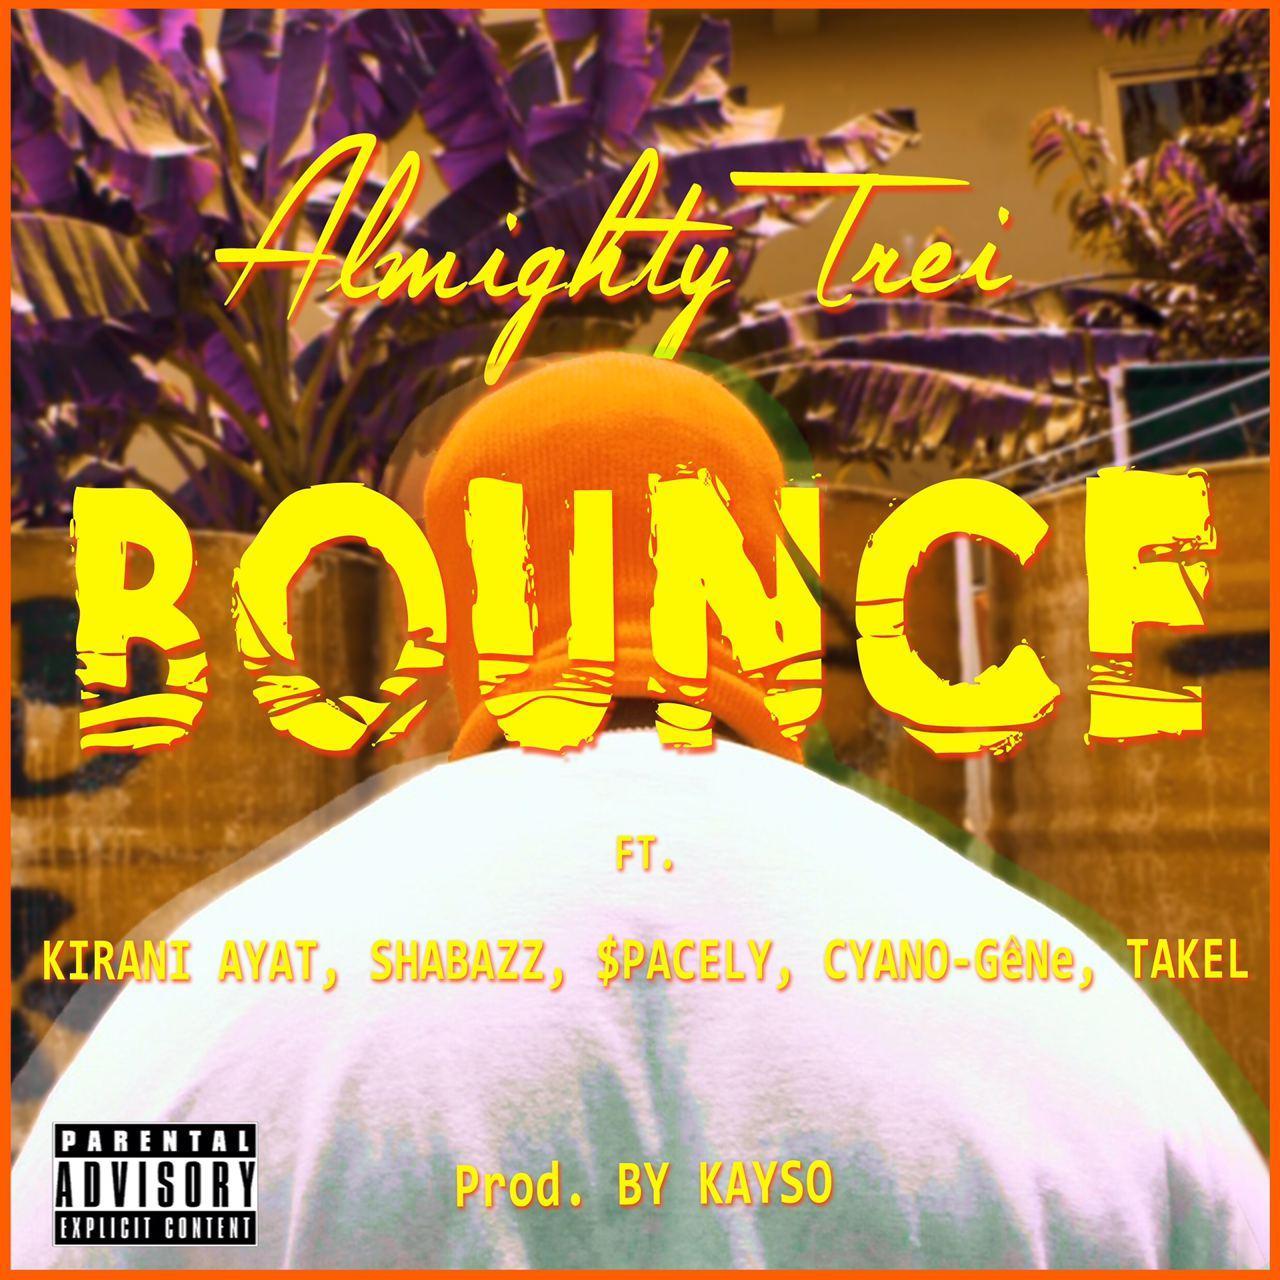 Bounce (feat. Kirani Ayat, Shabazz, $pacely, Cyano-Gene & Takel) Image